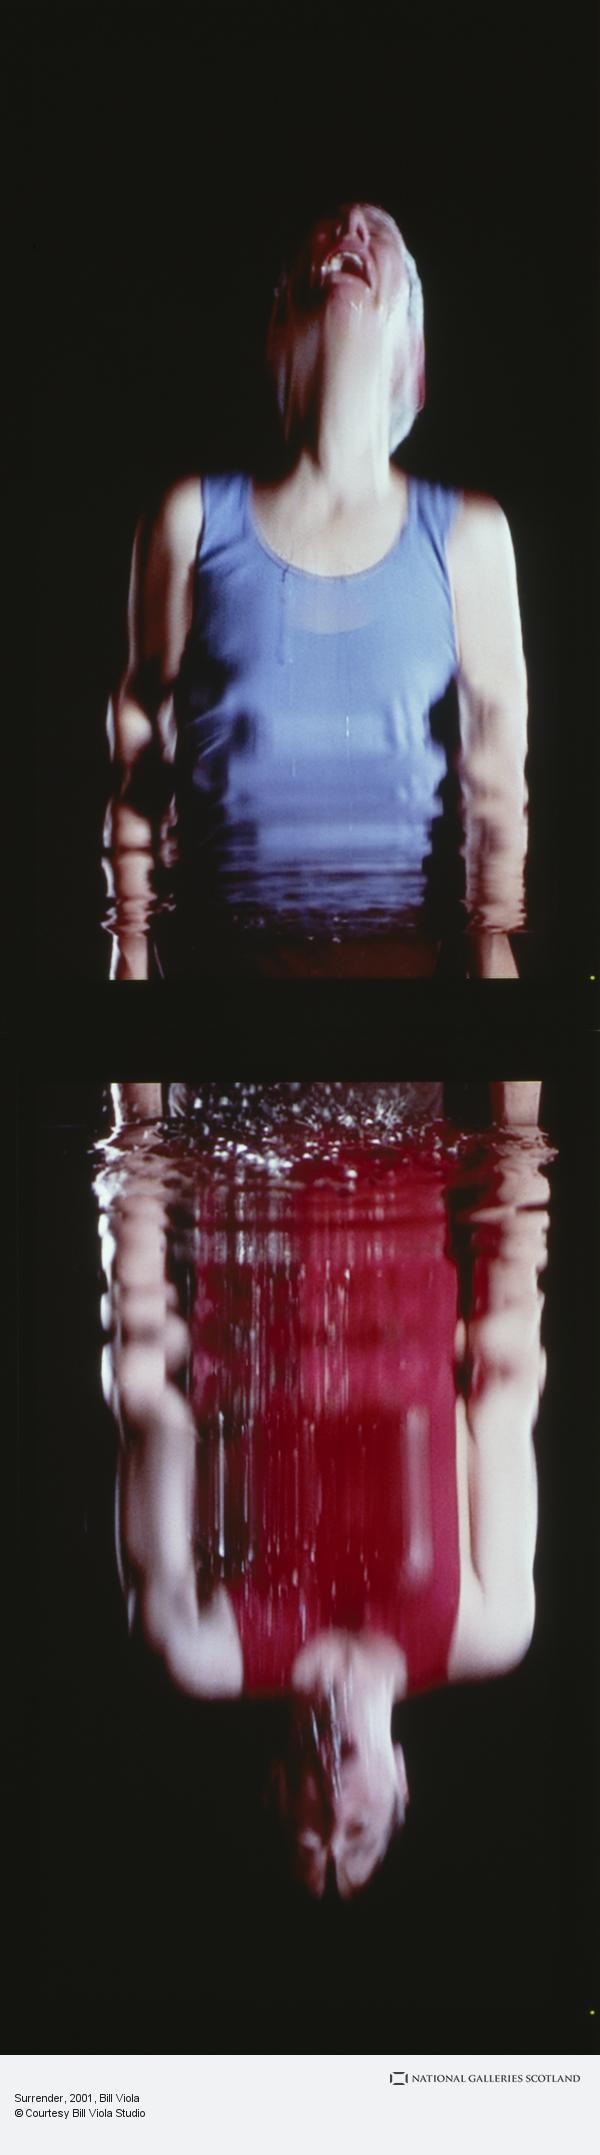 Bill Viola, Surrender (2001)